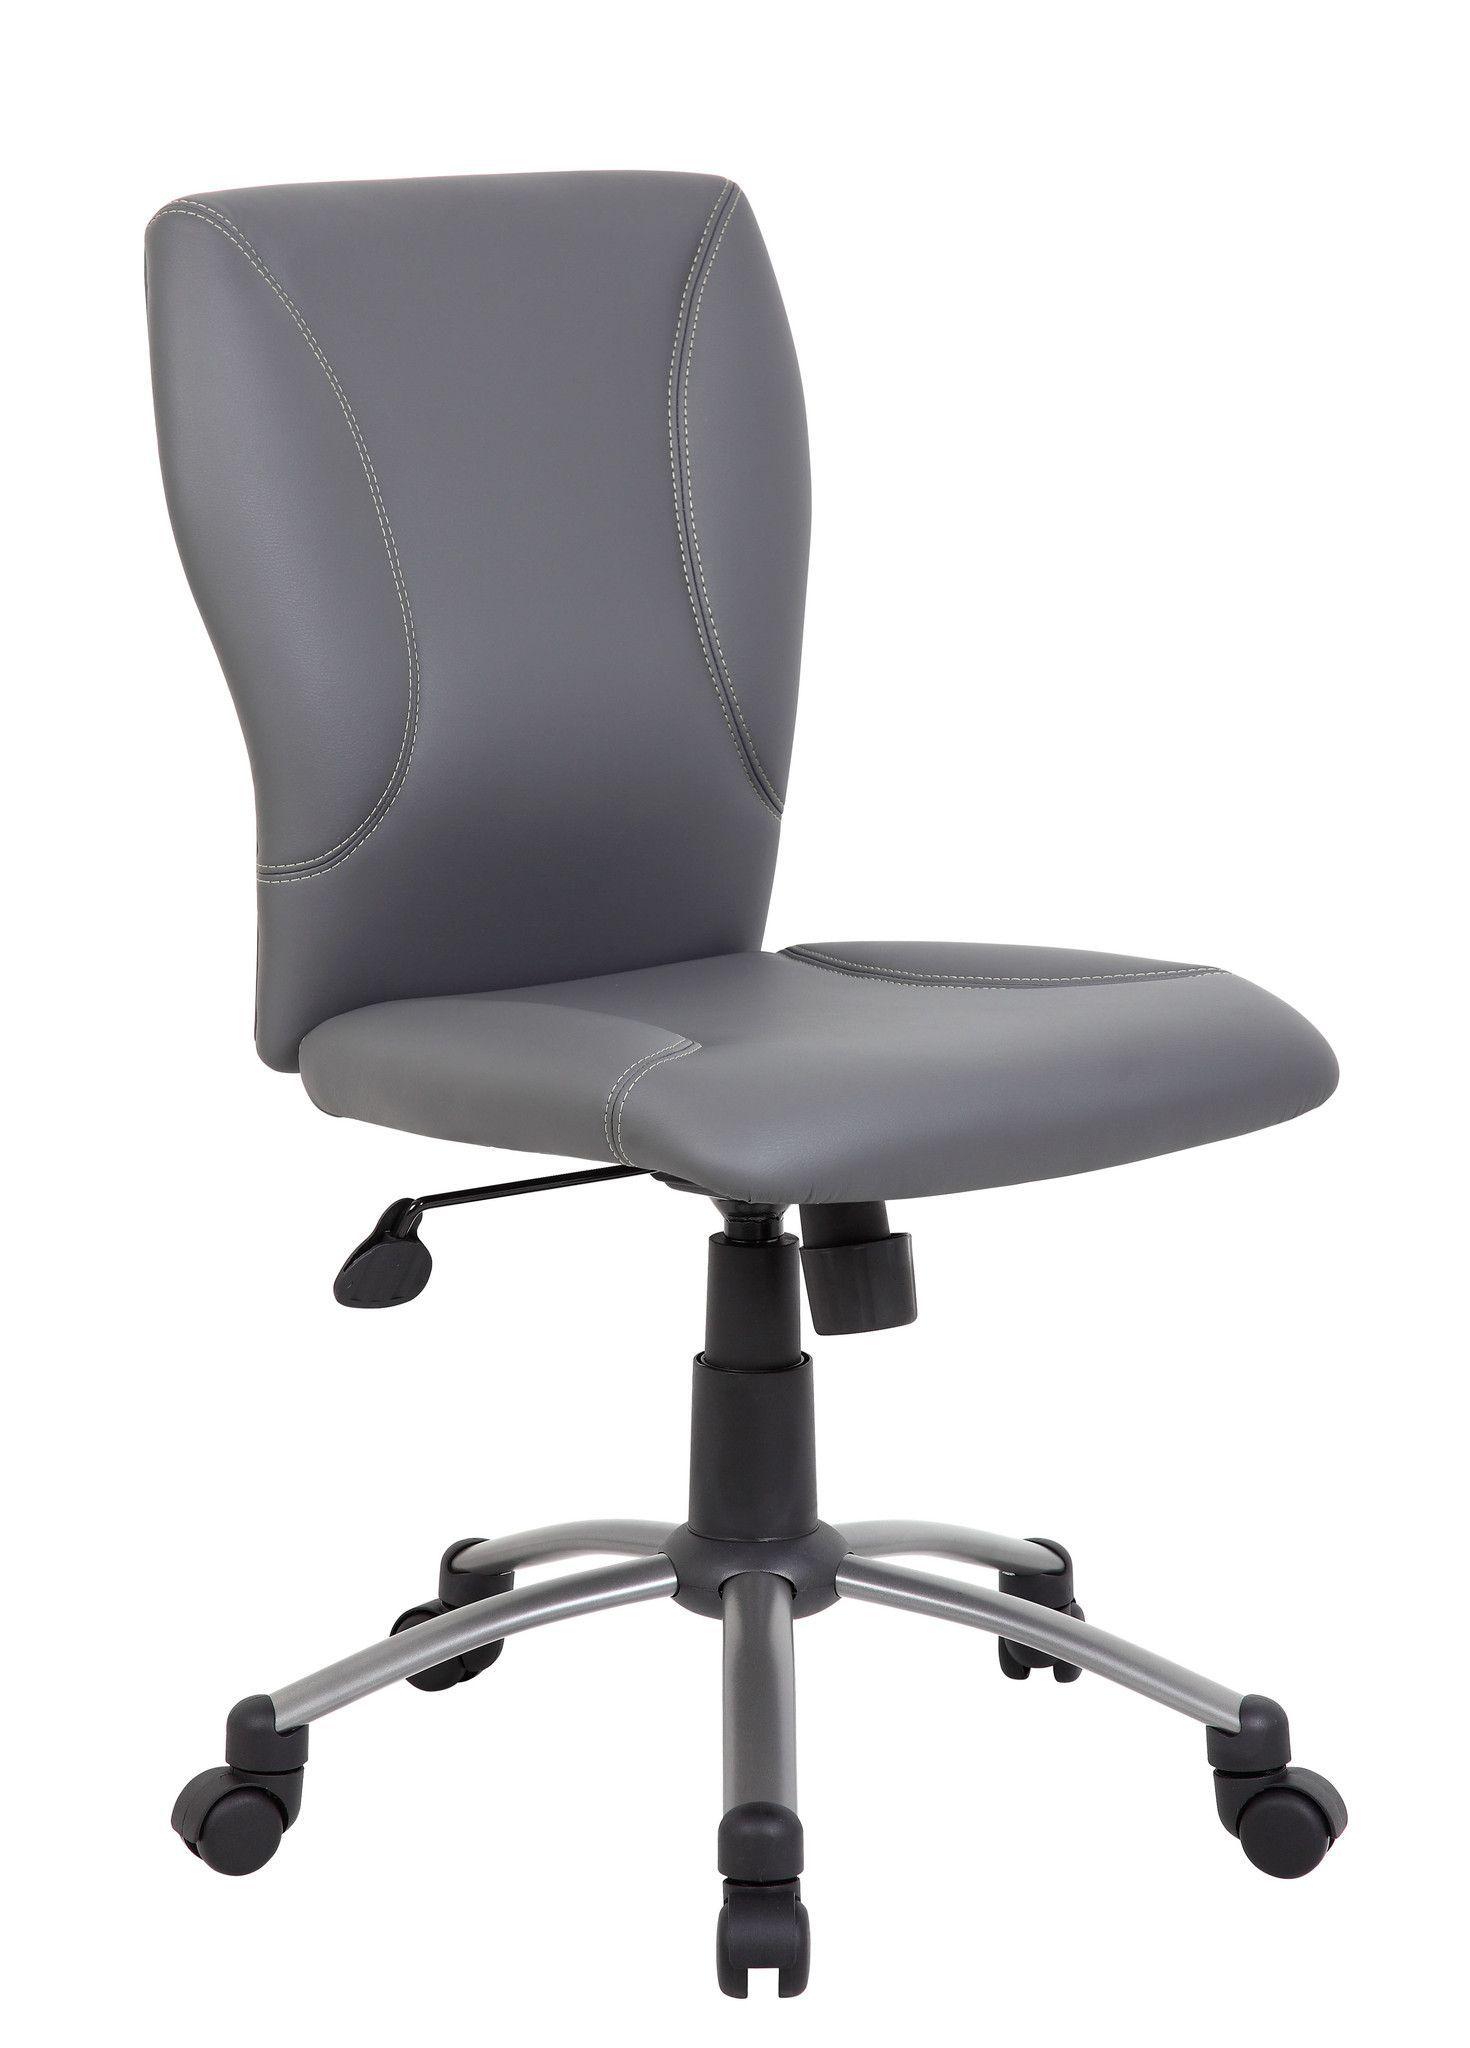 Boss Tiffany Caressoftplus Chair Grey B220 Gy Beautifully